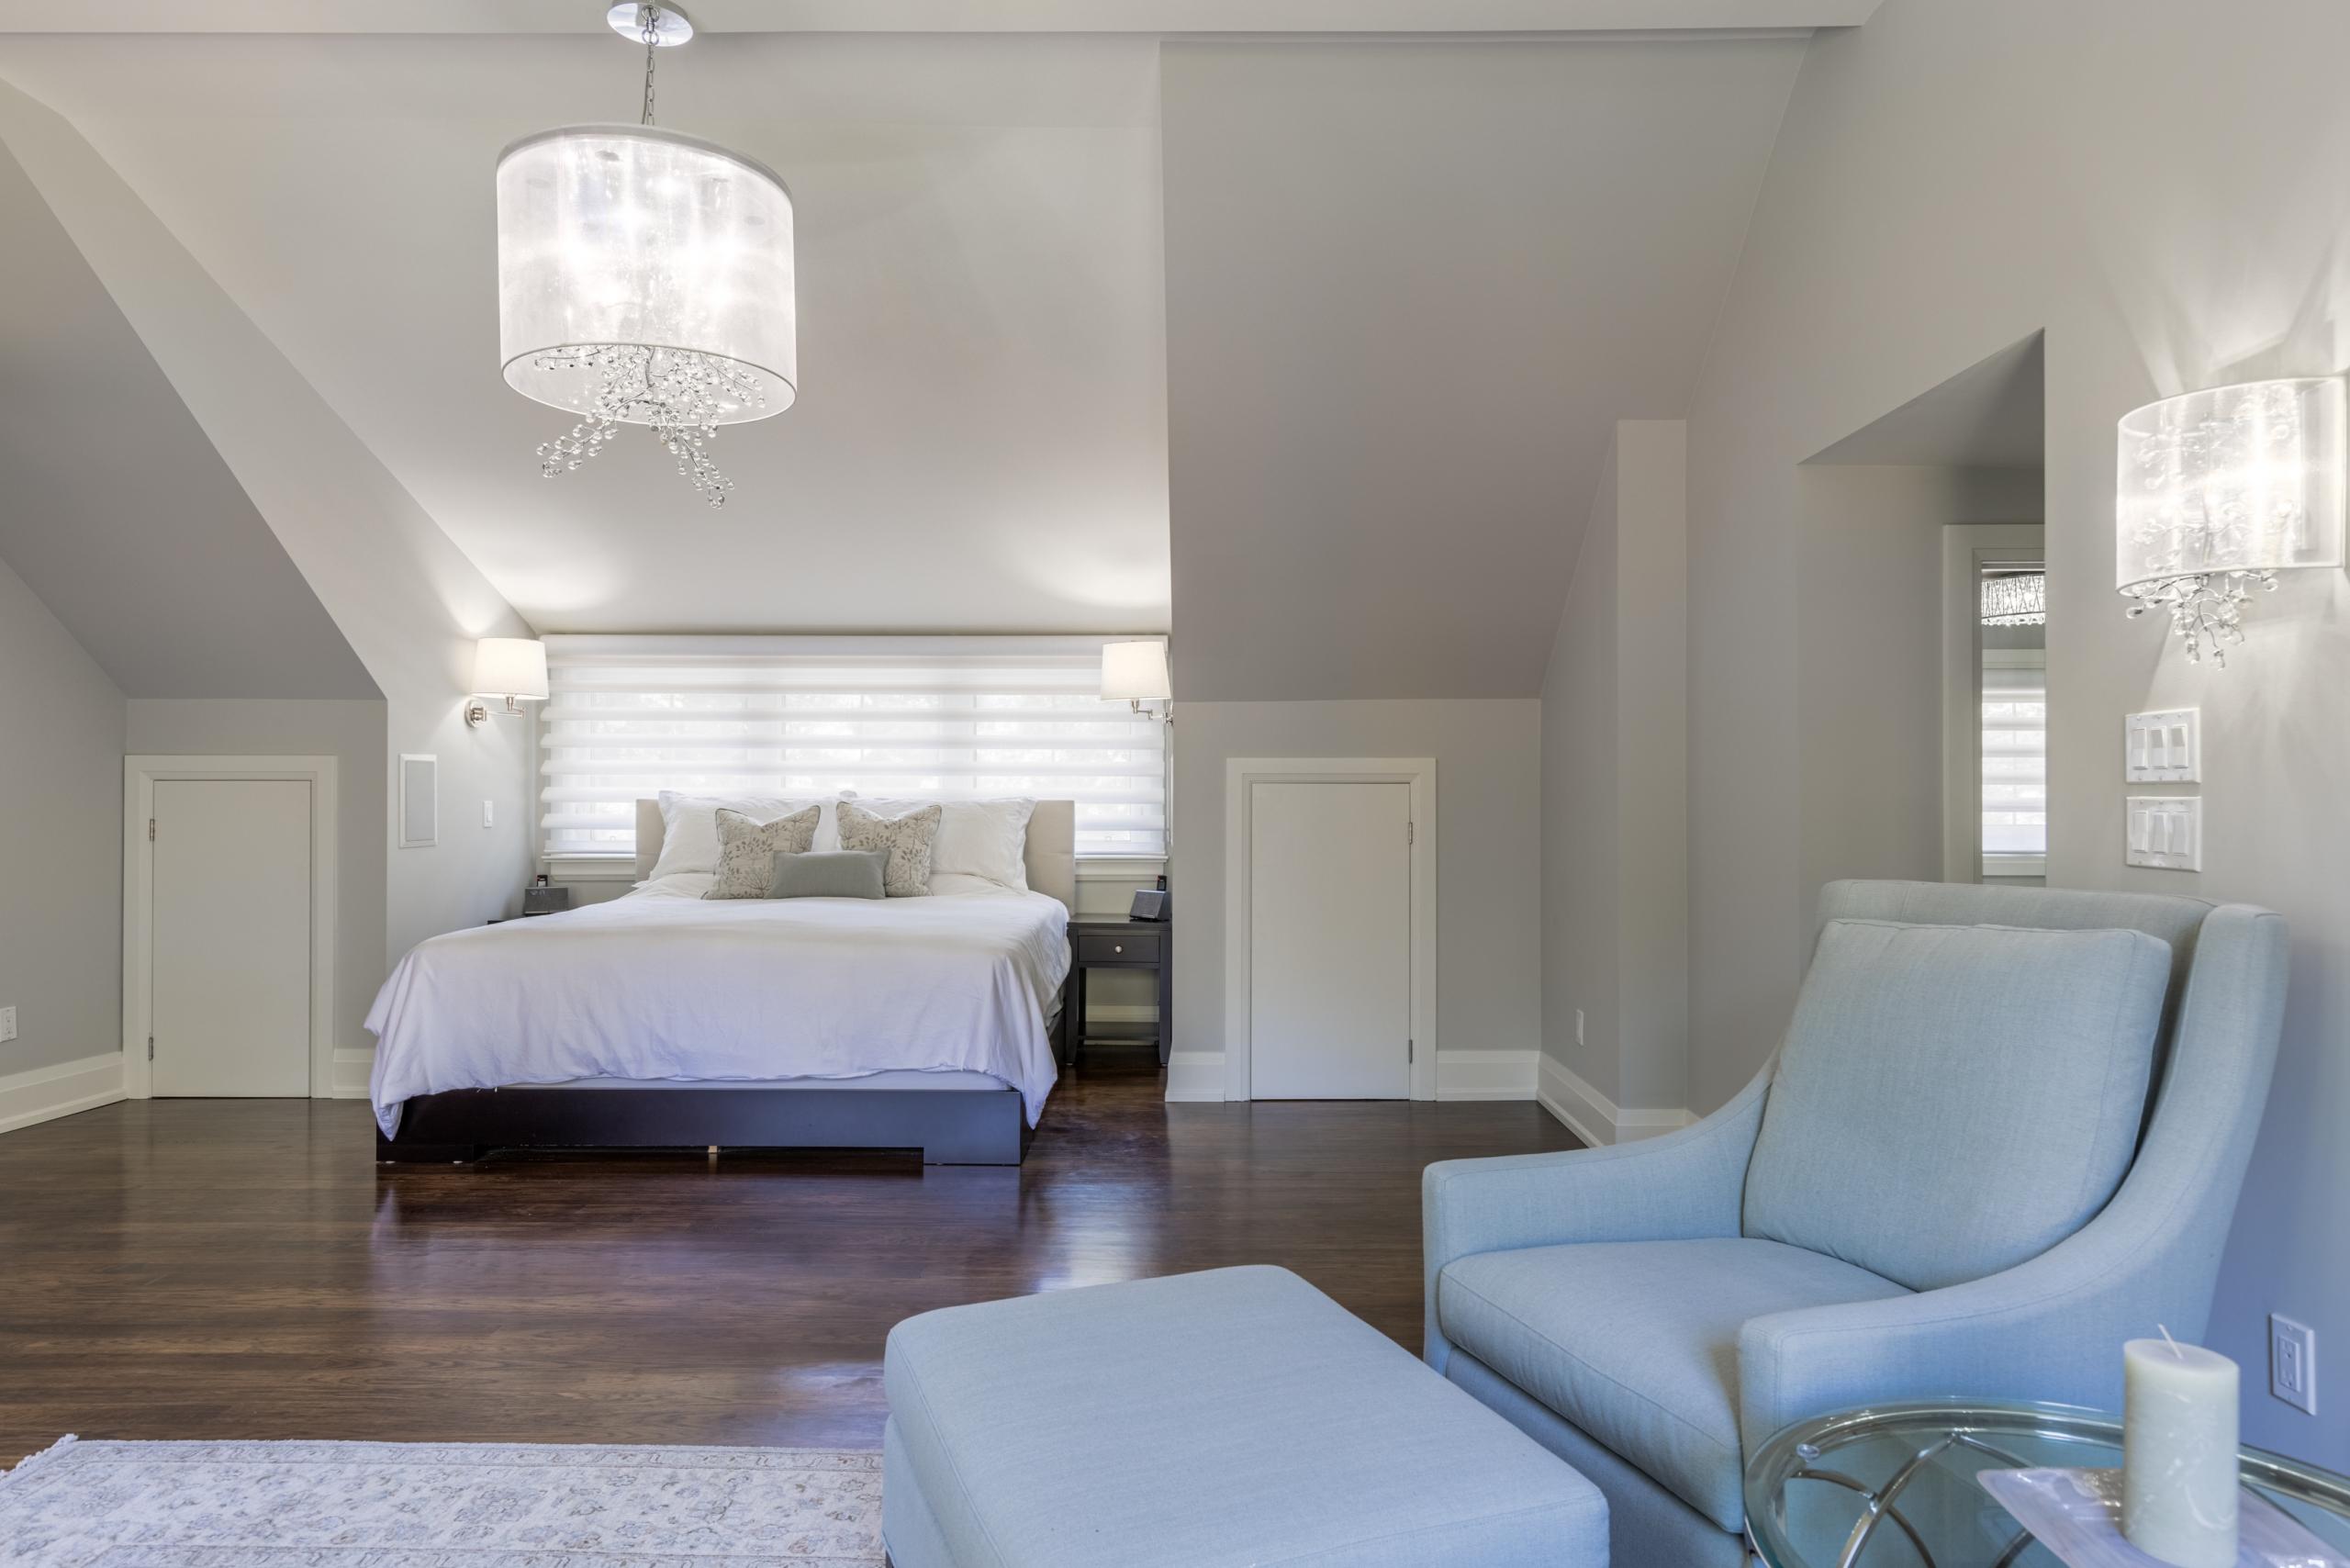 Bedroom featured at 1109 Morrison Heights Drive, Oakville at Alex Irish & Associates